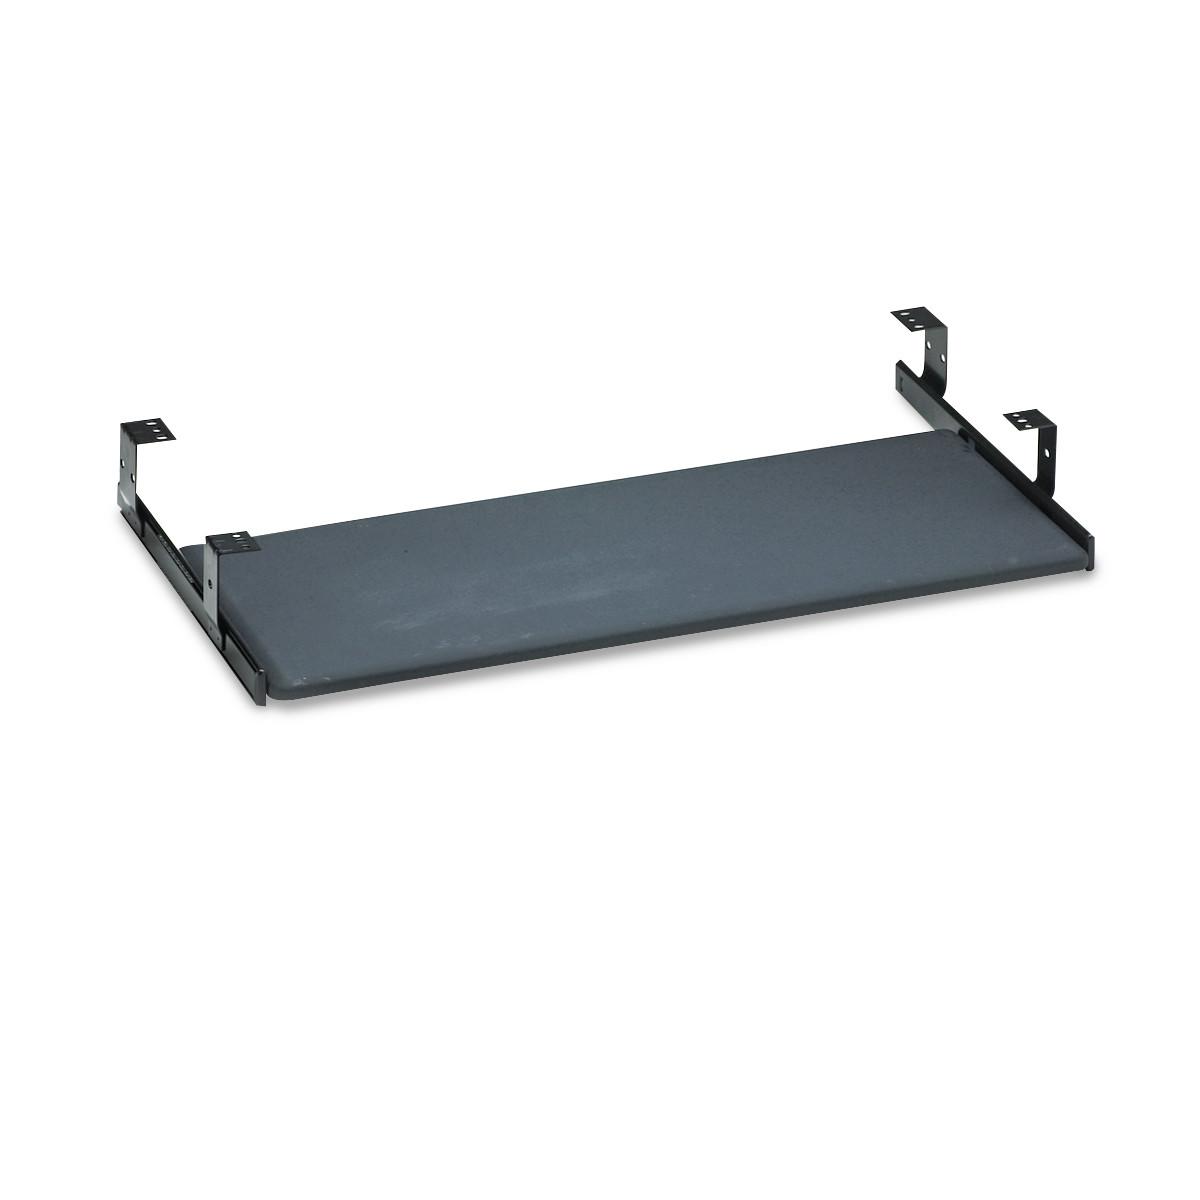 Universal Keyboard Shelf Accessory, 30 1/8w x 16 5/8d x 4h, Black